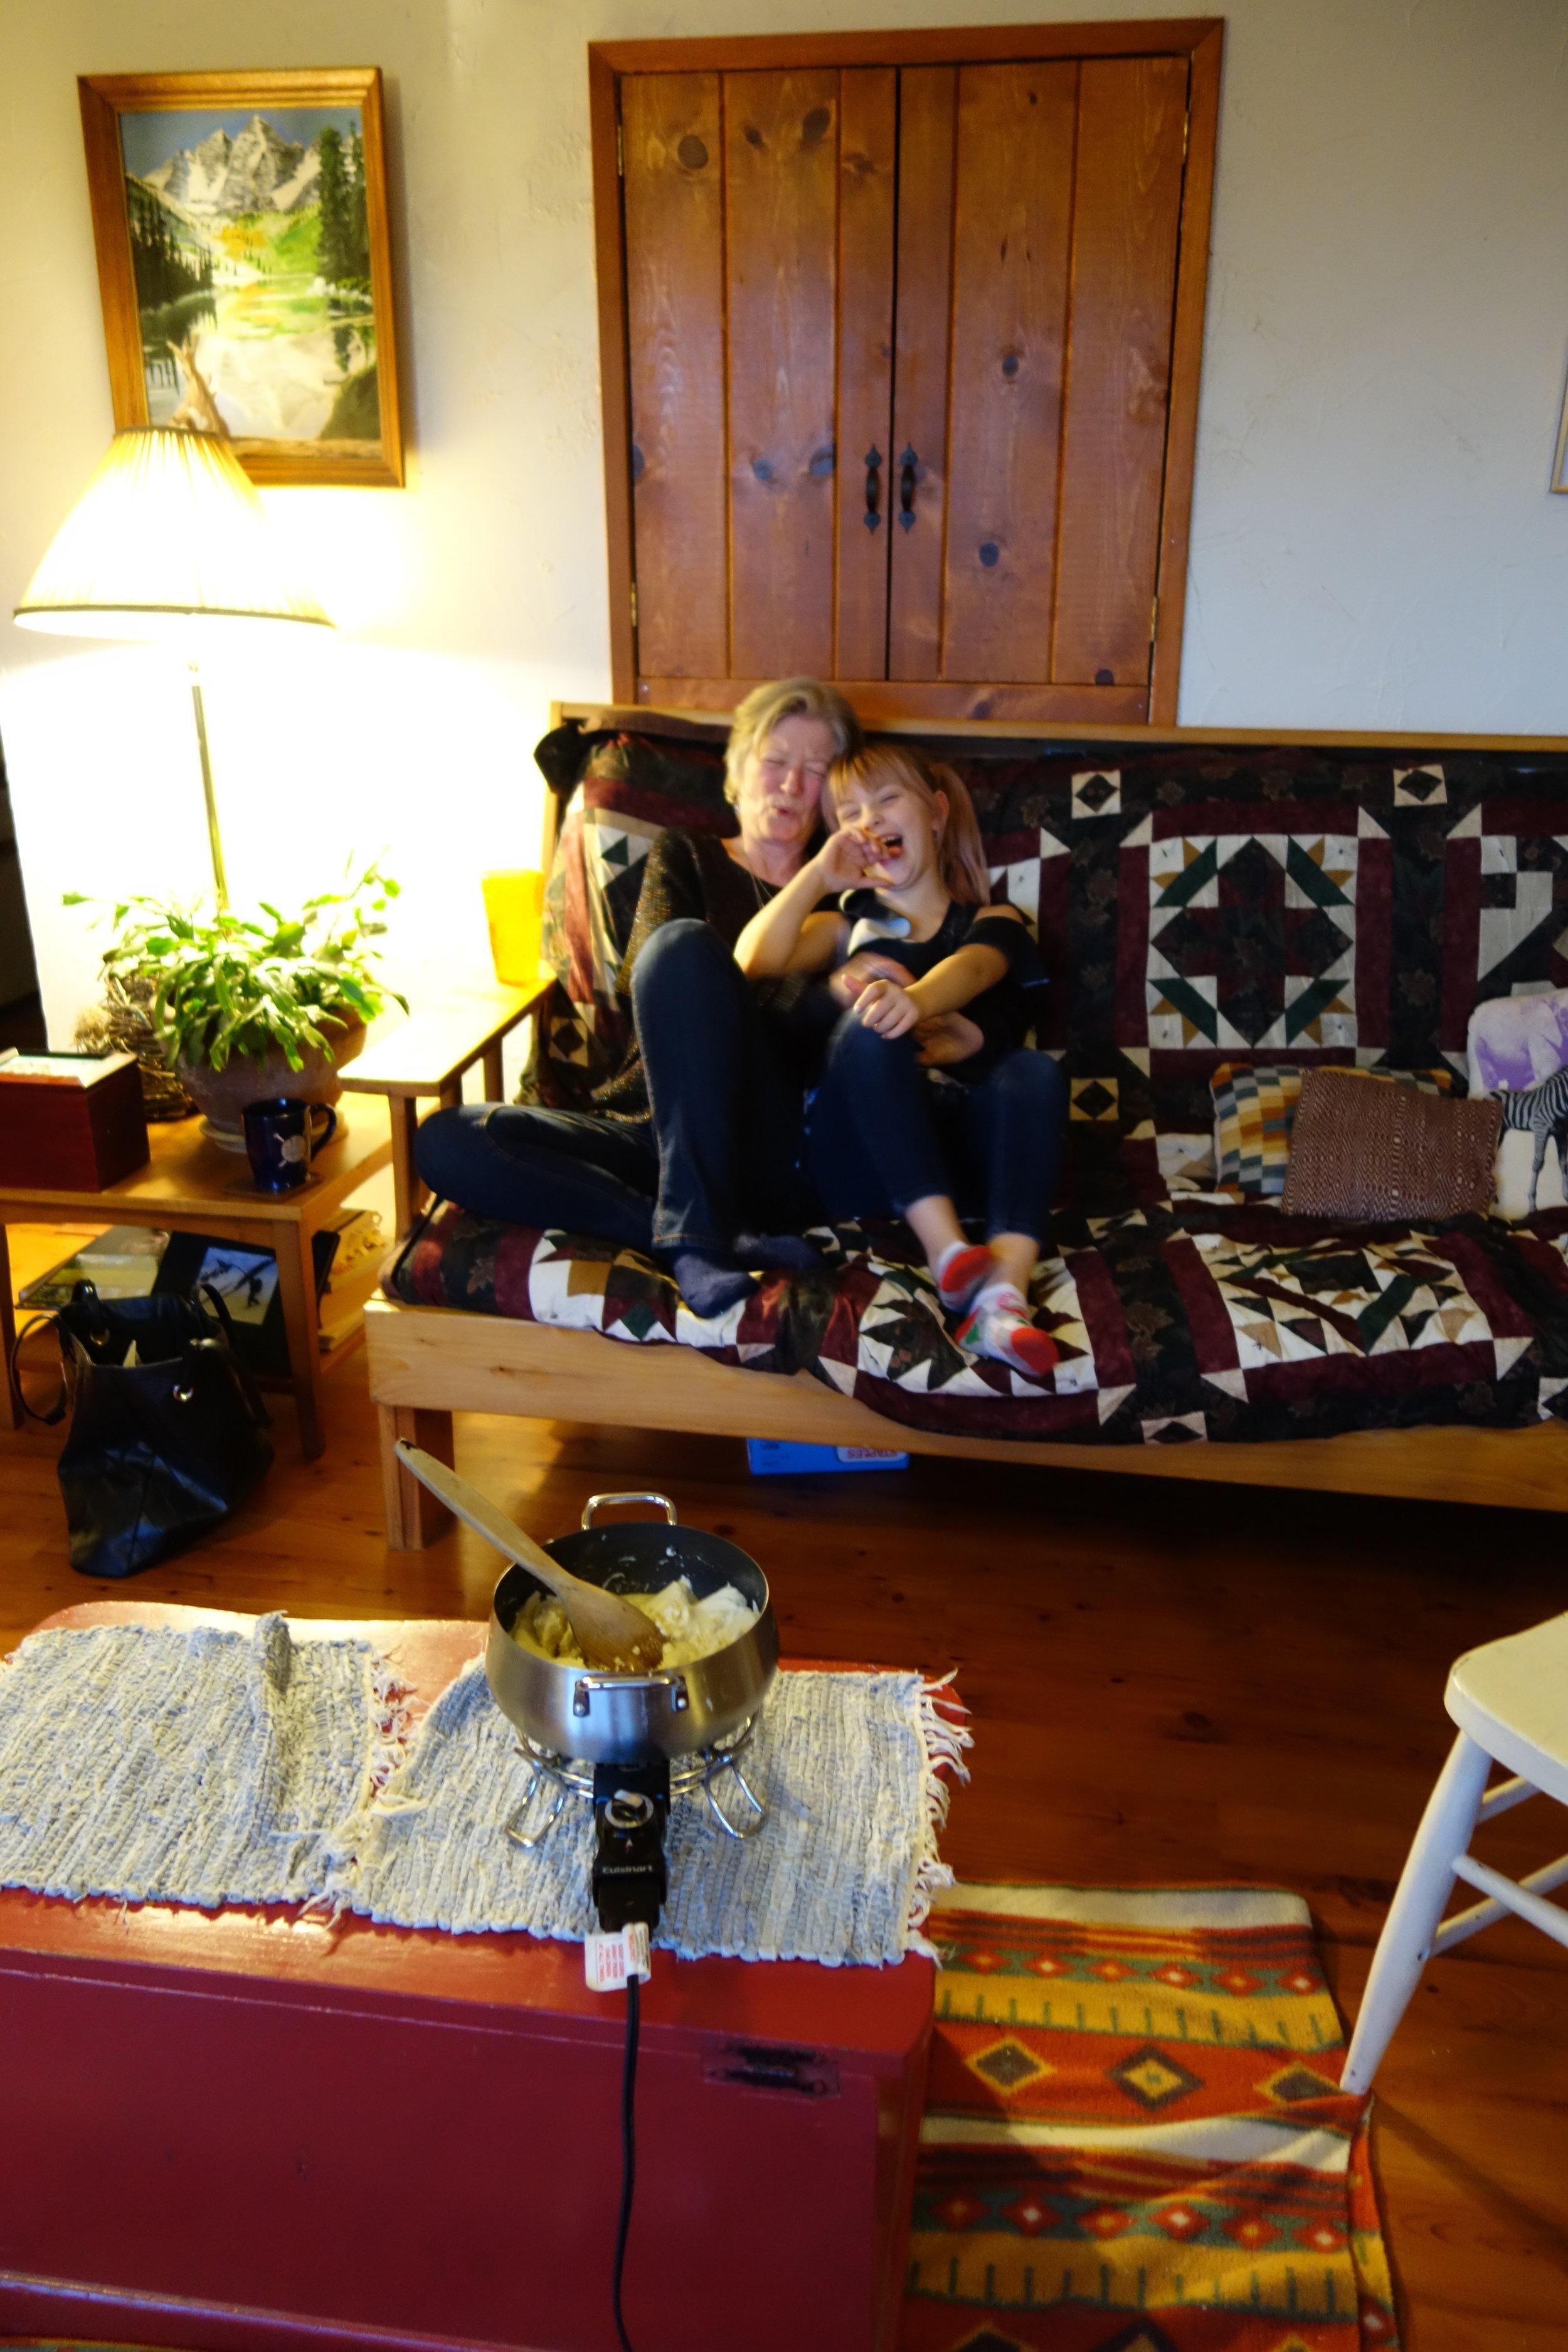 Karyne, Ron's friend, and London, Karyne's granddaughter.